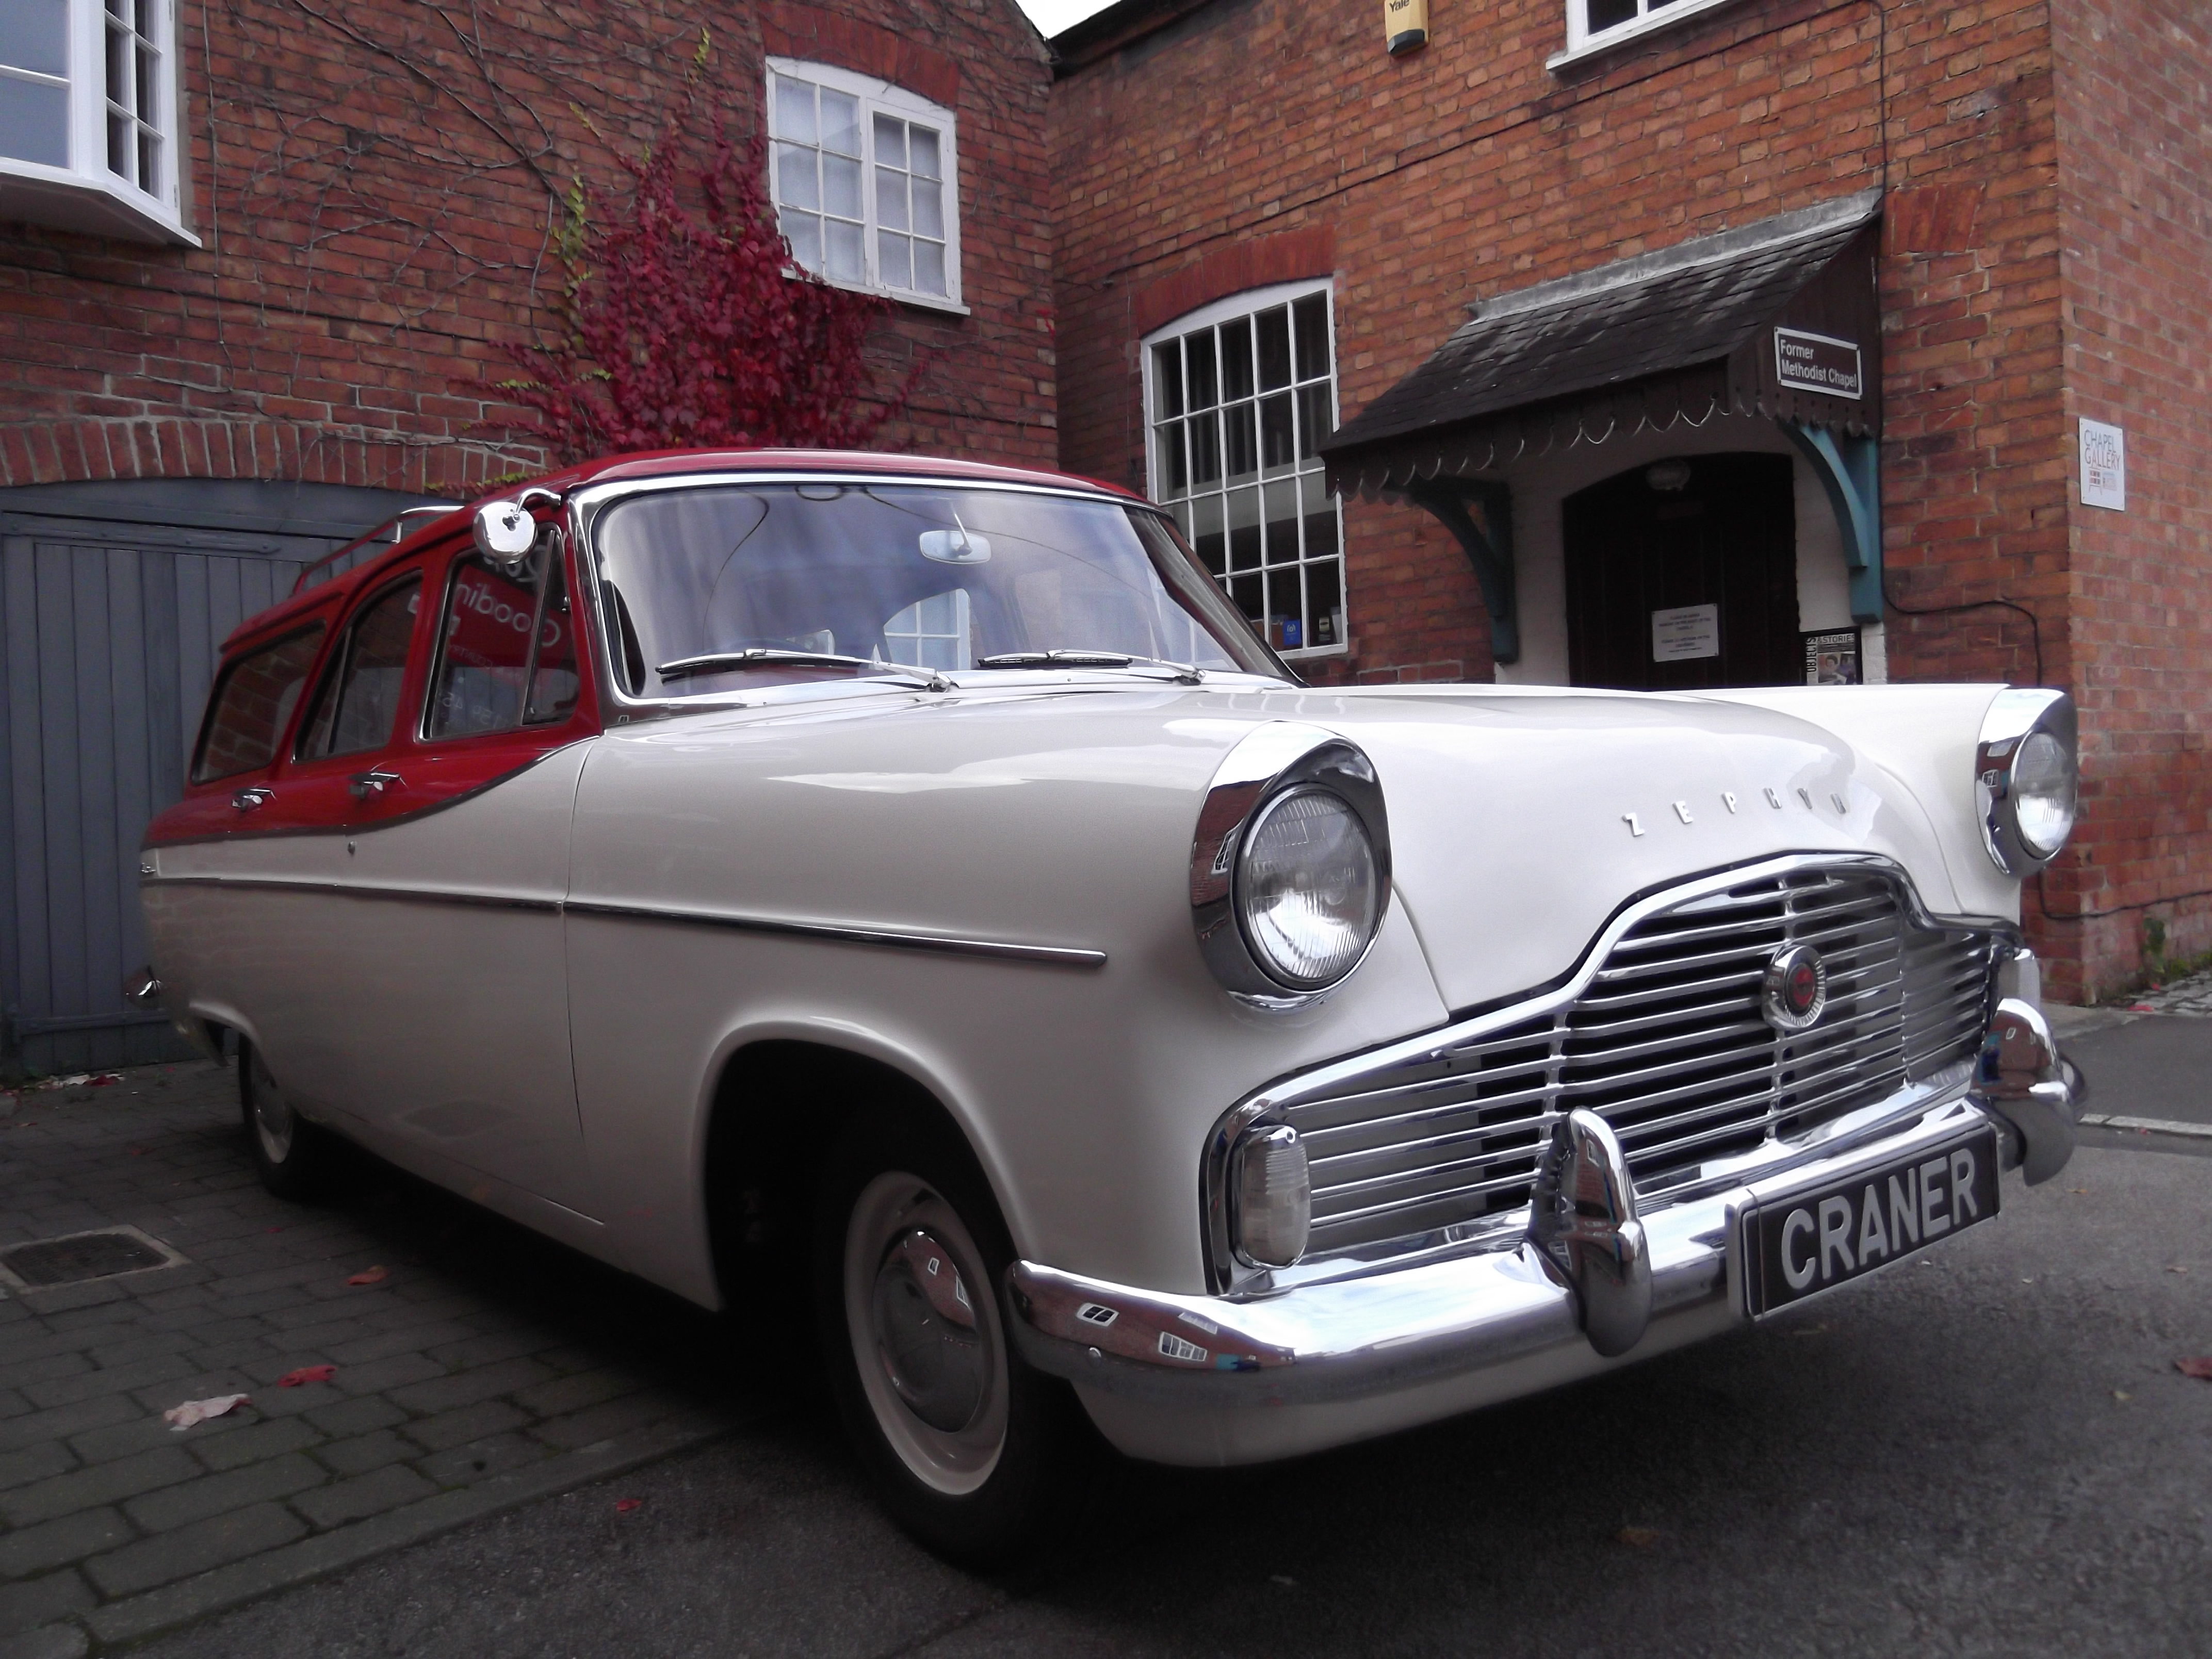 1960 Ford Zephyr Mark II